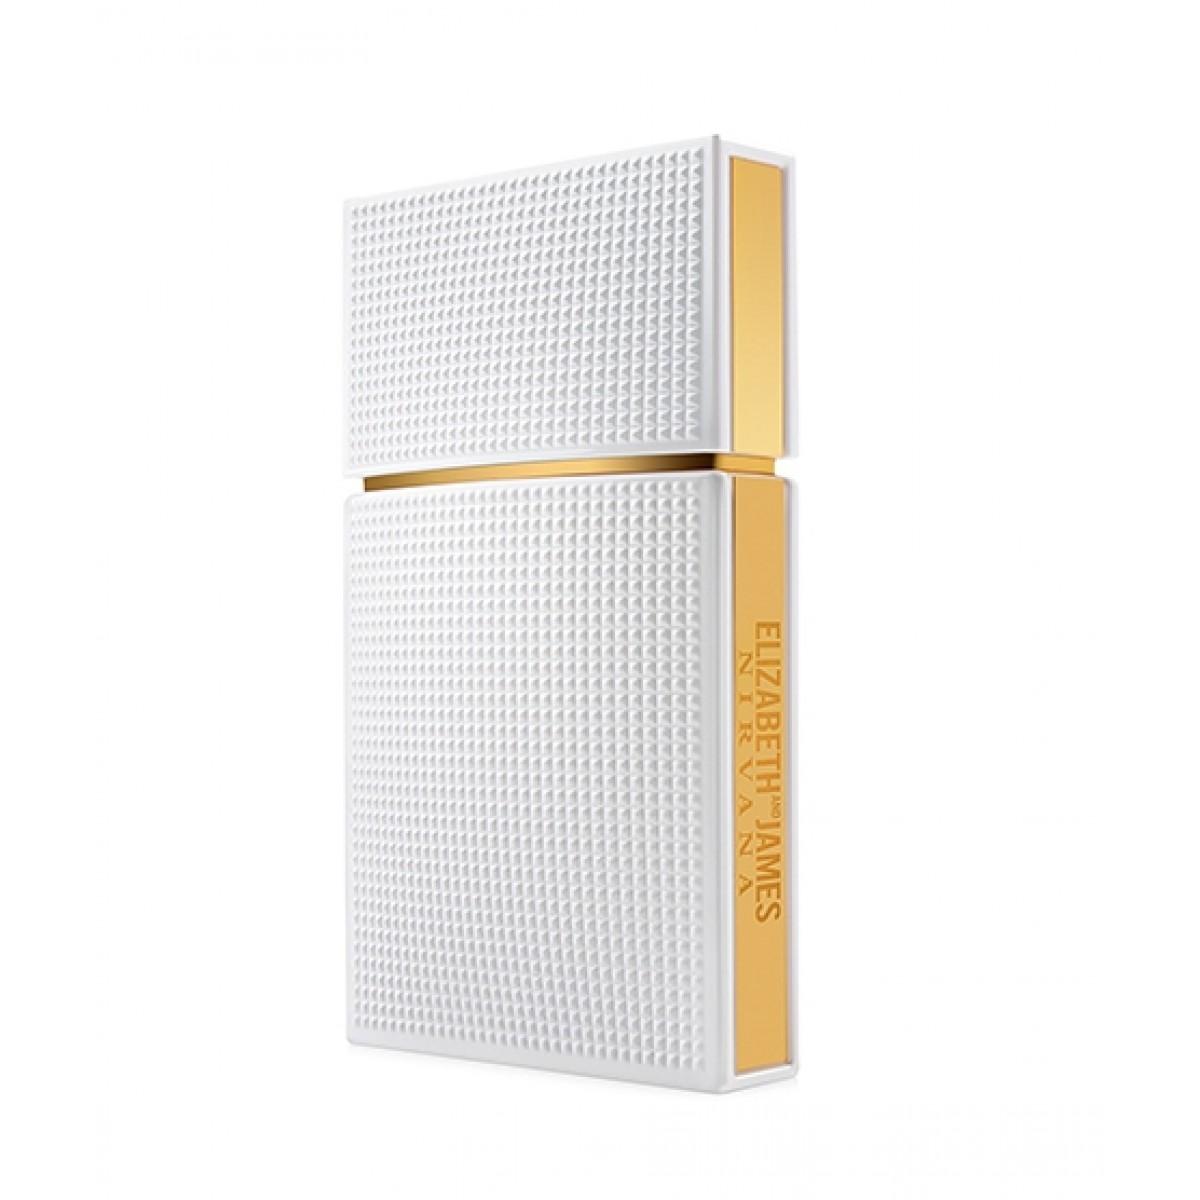 Elizabeth & James Nirvana White EDP Perfume For Women 50ML